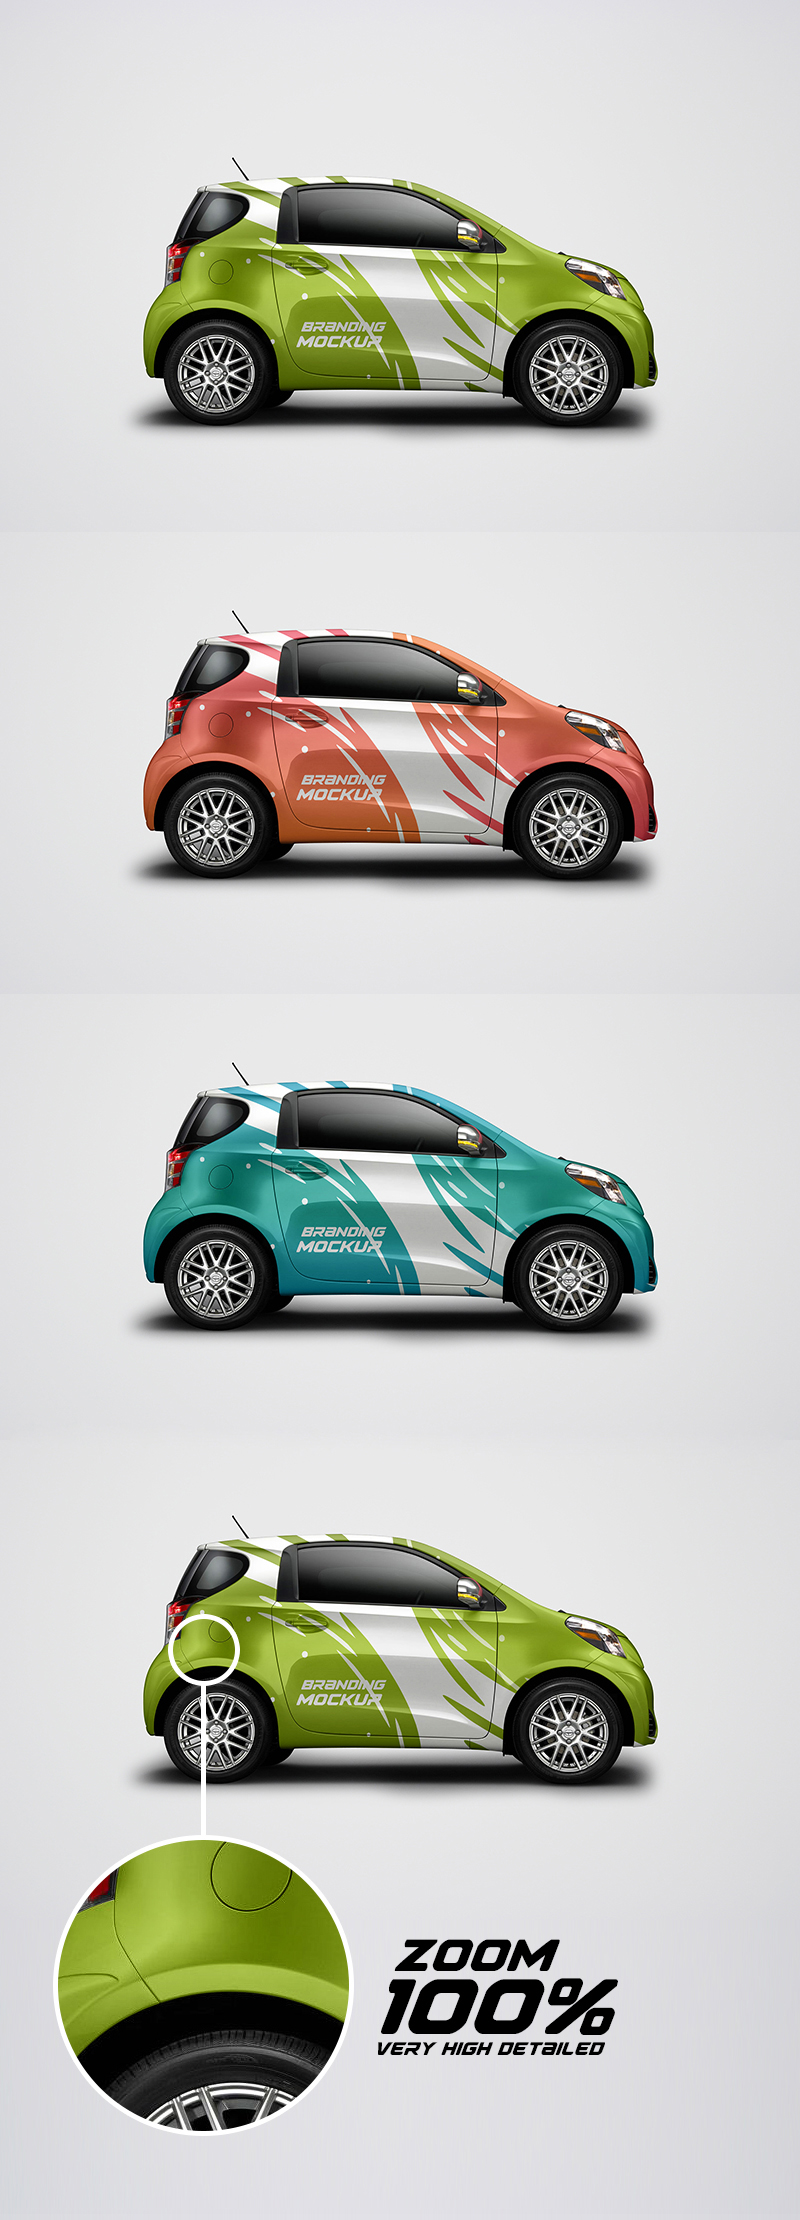 Download Electric Car Mockup Free Psd Graphicsegg PSD Mockup Templates